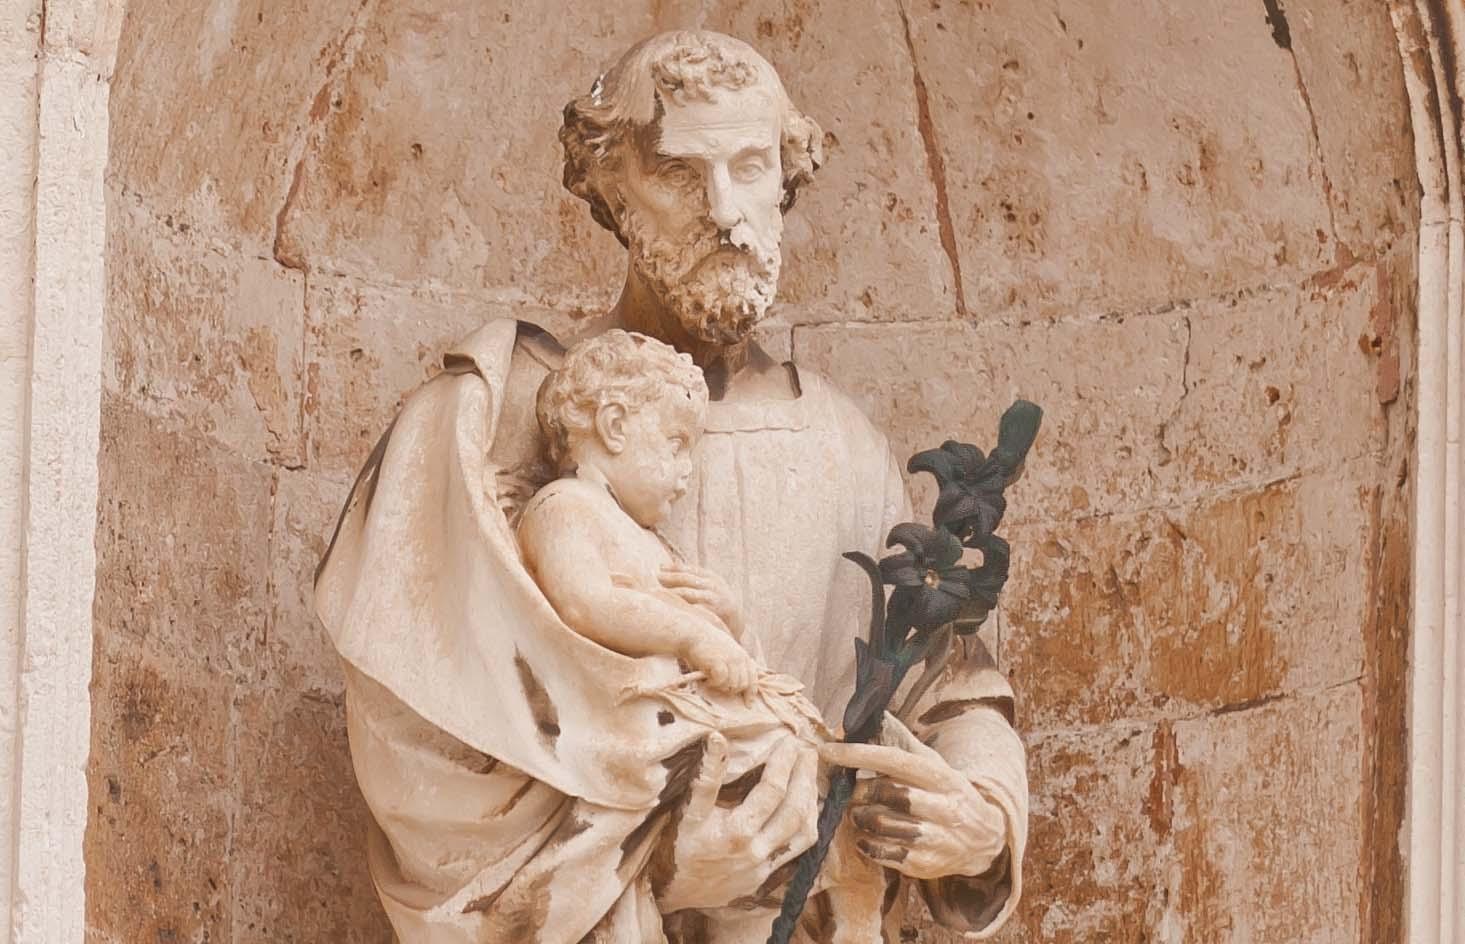 Dubrovnik saint statue